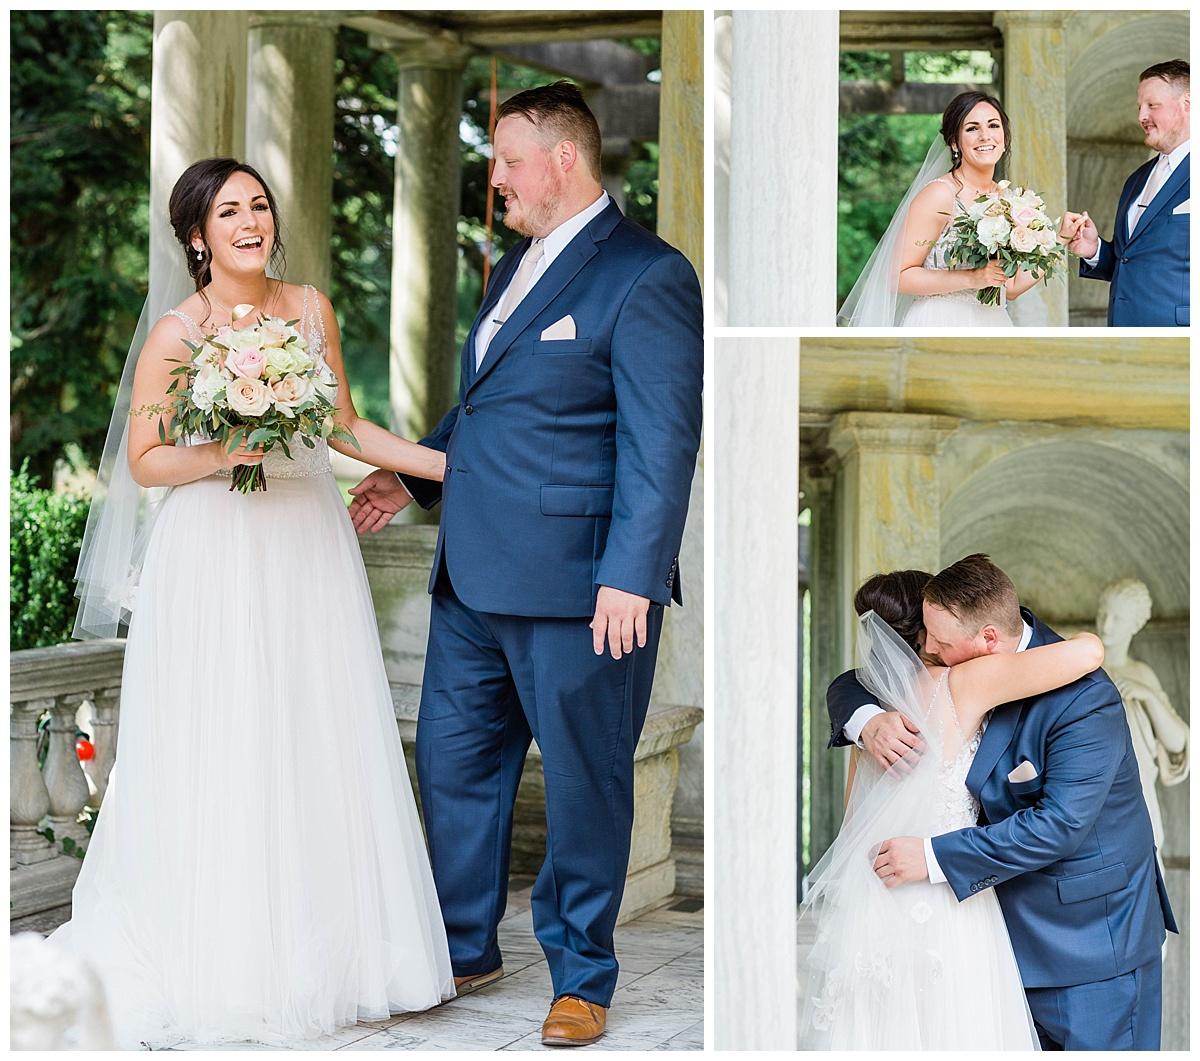 Rachel and Nick - Sonnenberg Gardens Wedding-147.jpg